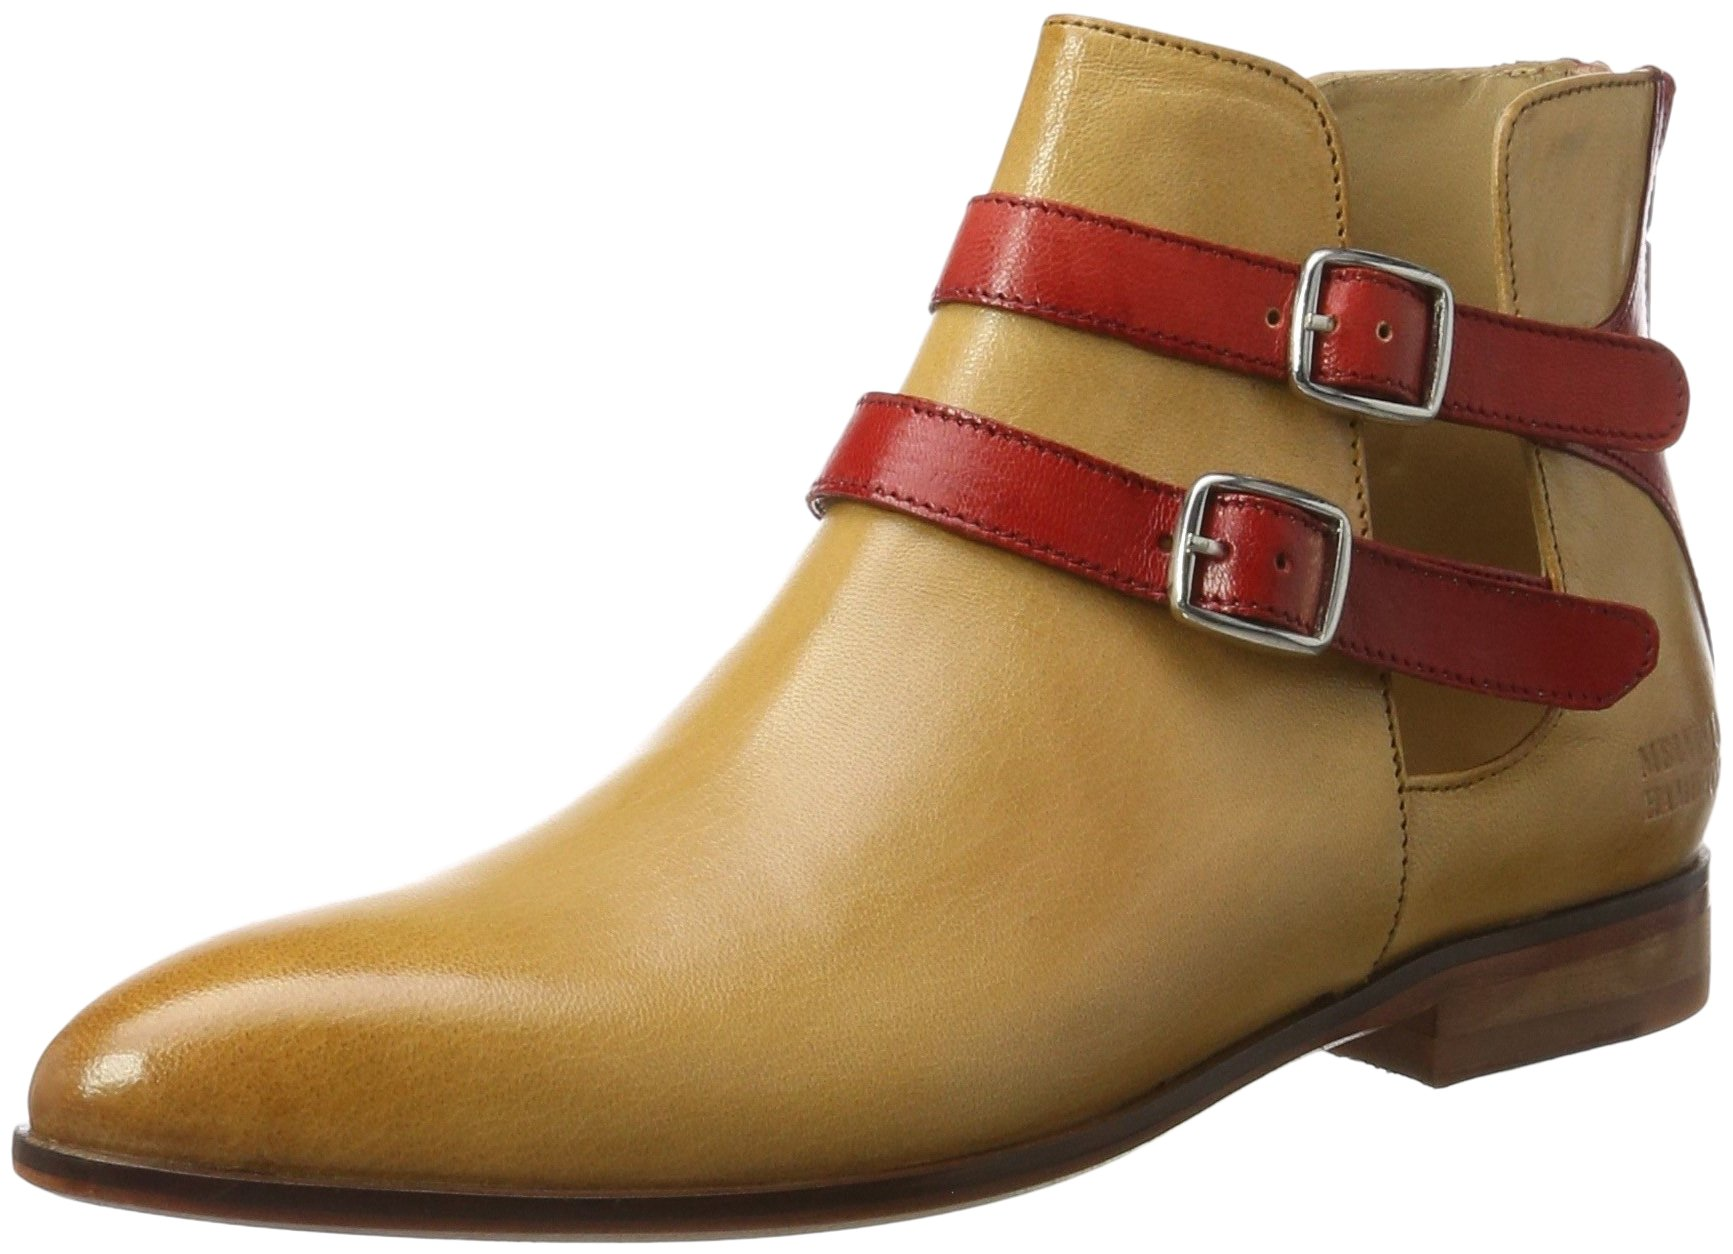 Ls nat42 Jessy FemmeVenice straps 19Chelsea Hamilton Red Melvinamp; Eu Boots Beige QChxtrsd